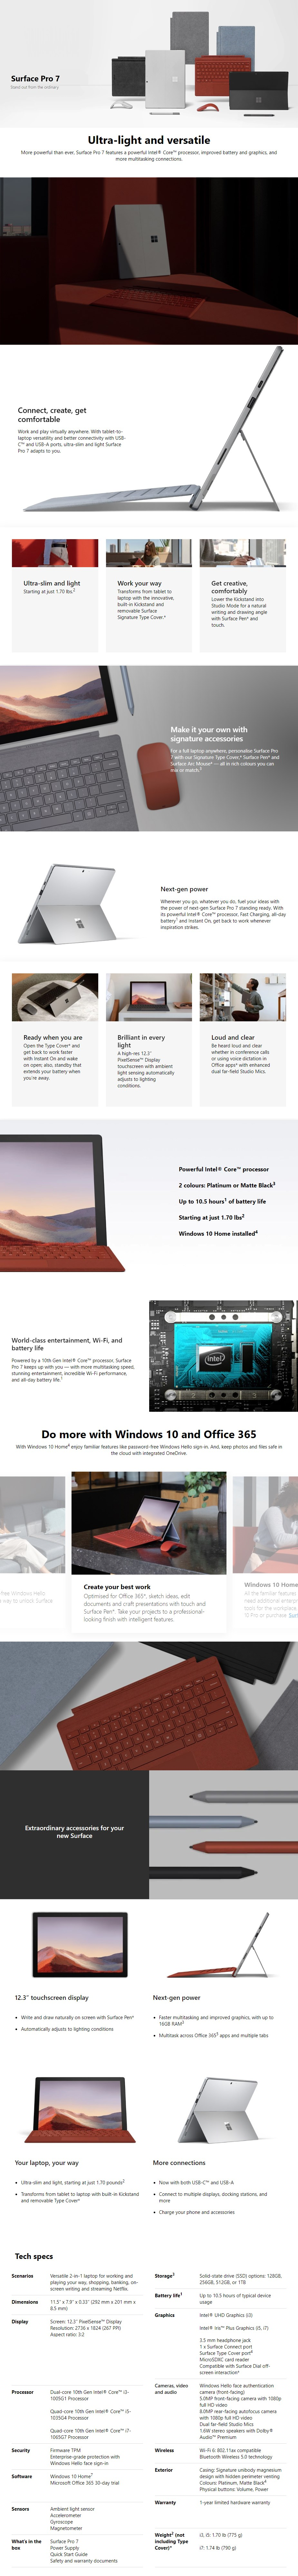 "Microsoft Surface Pro 7 12.3"" Core i5-1035G4 8GB 128GB W10P - Platinum - Overview 1"